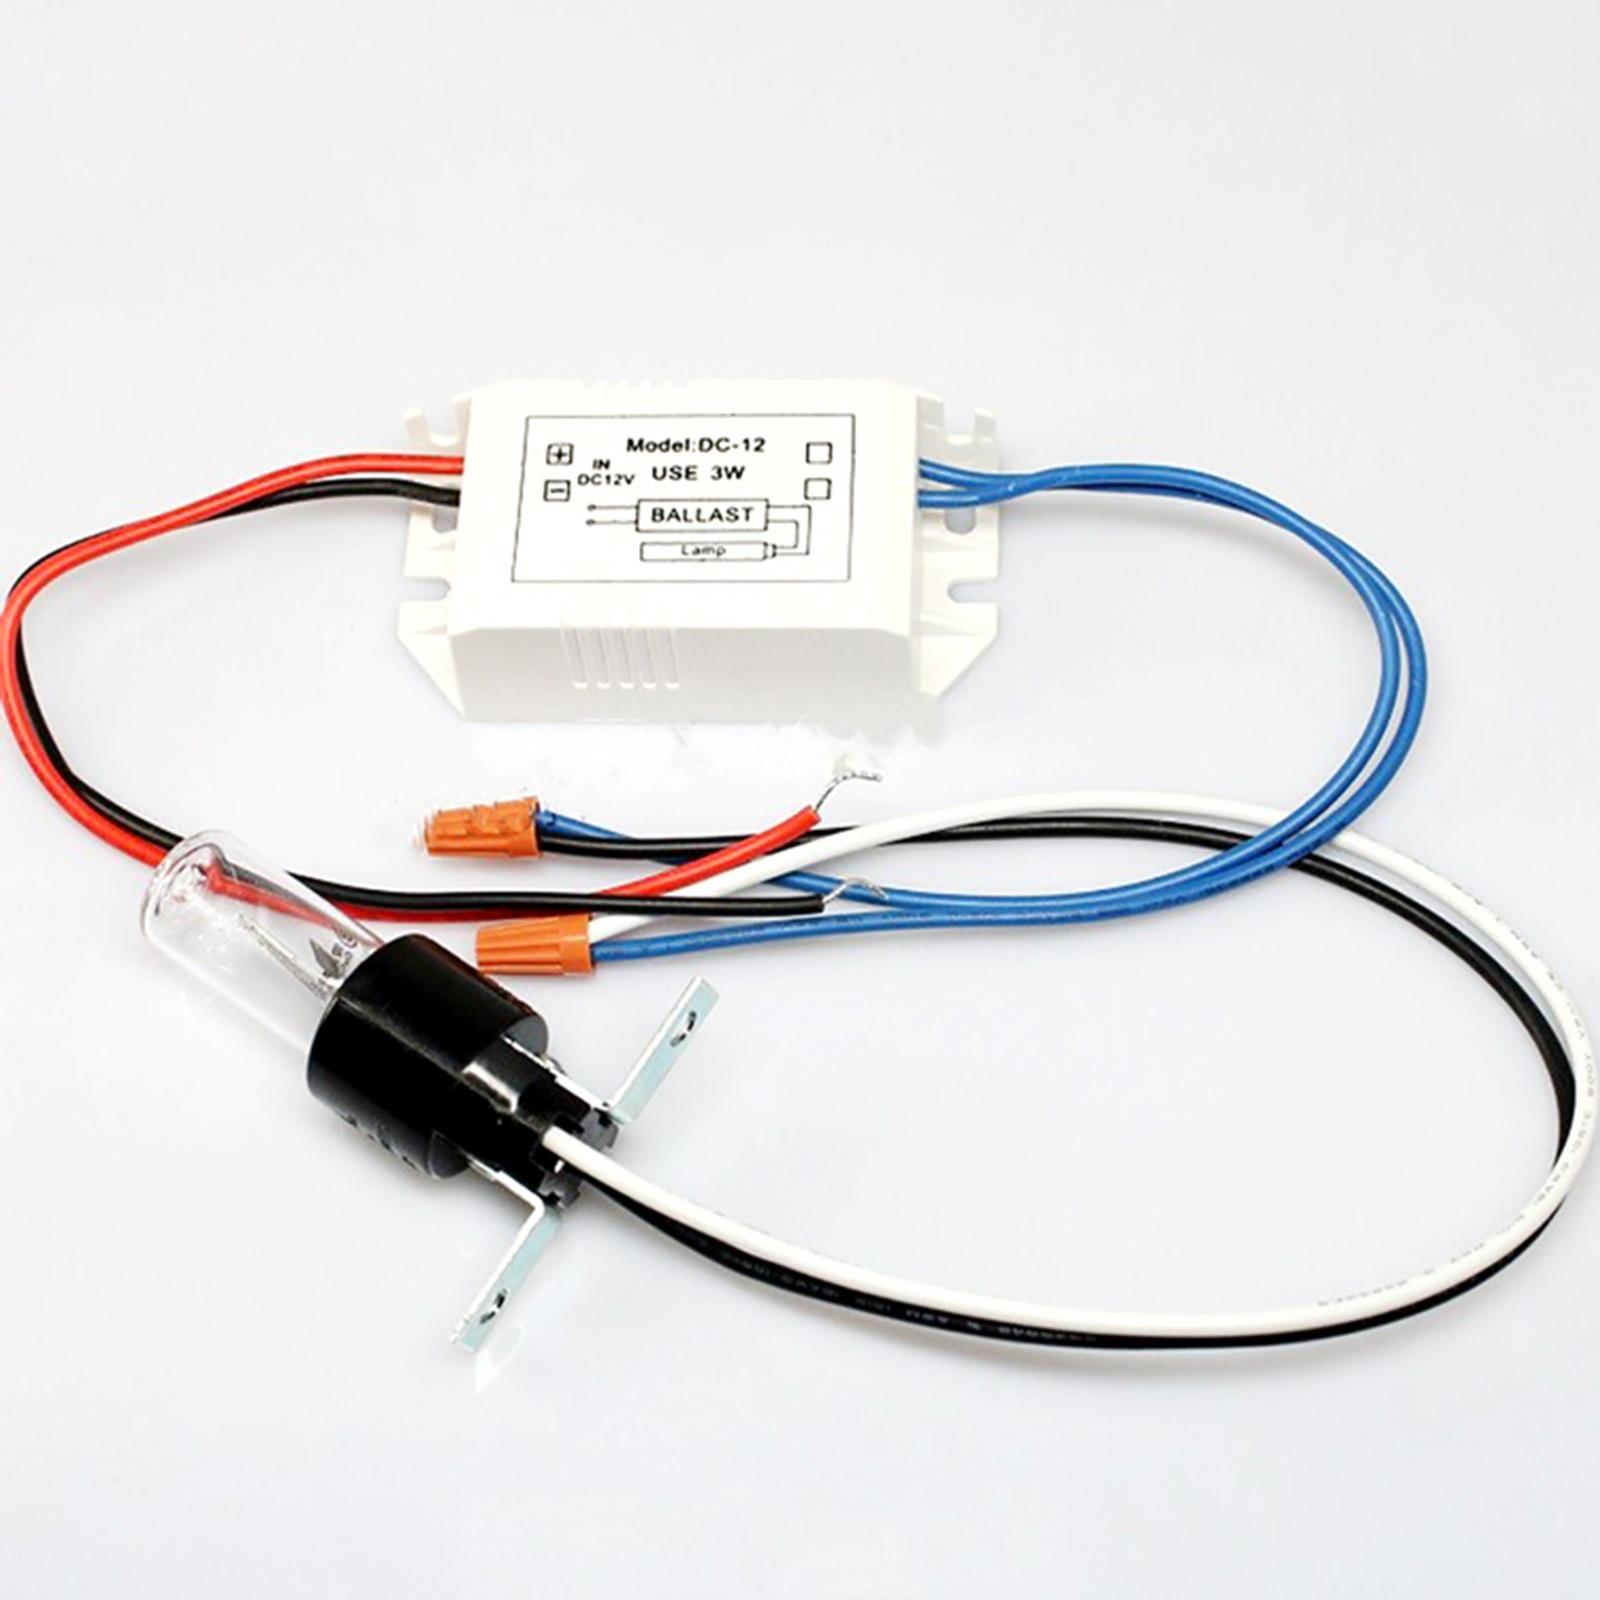 CNLIGHT Capacitor UV Bulb Sterilizing Lamp UVC 254nm 10V 3W AC/DC 110V/220V 12V Set